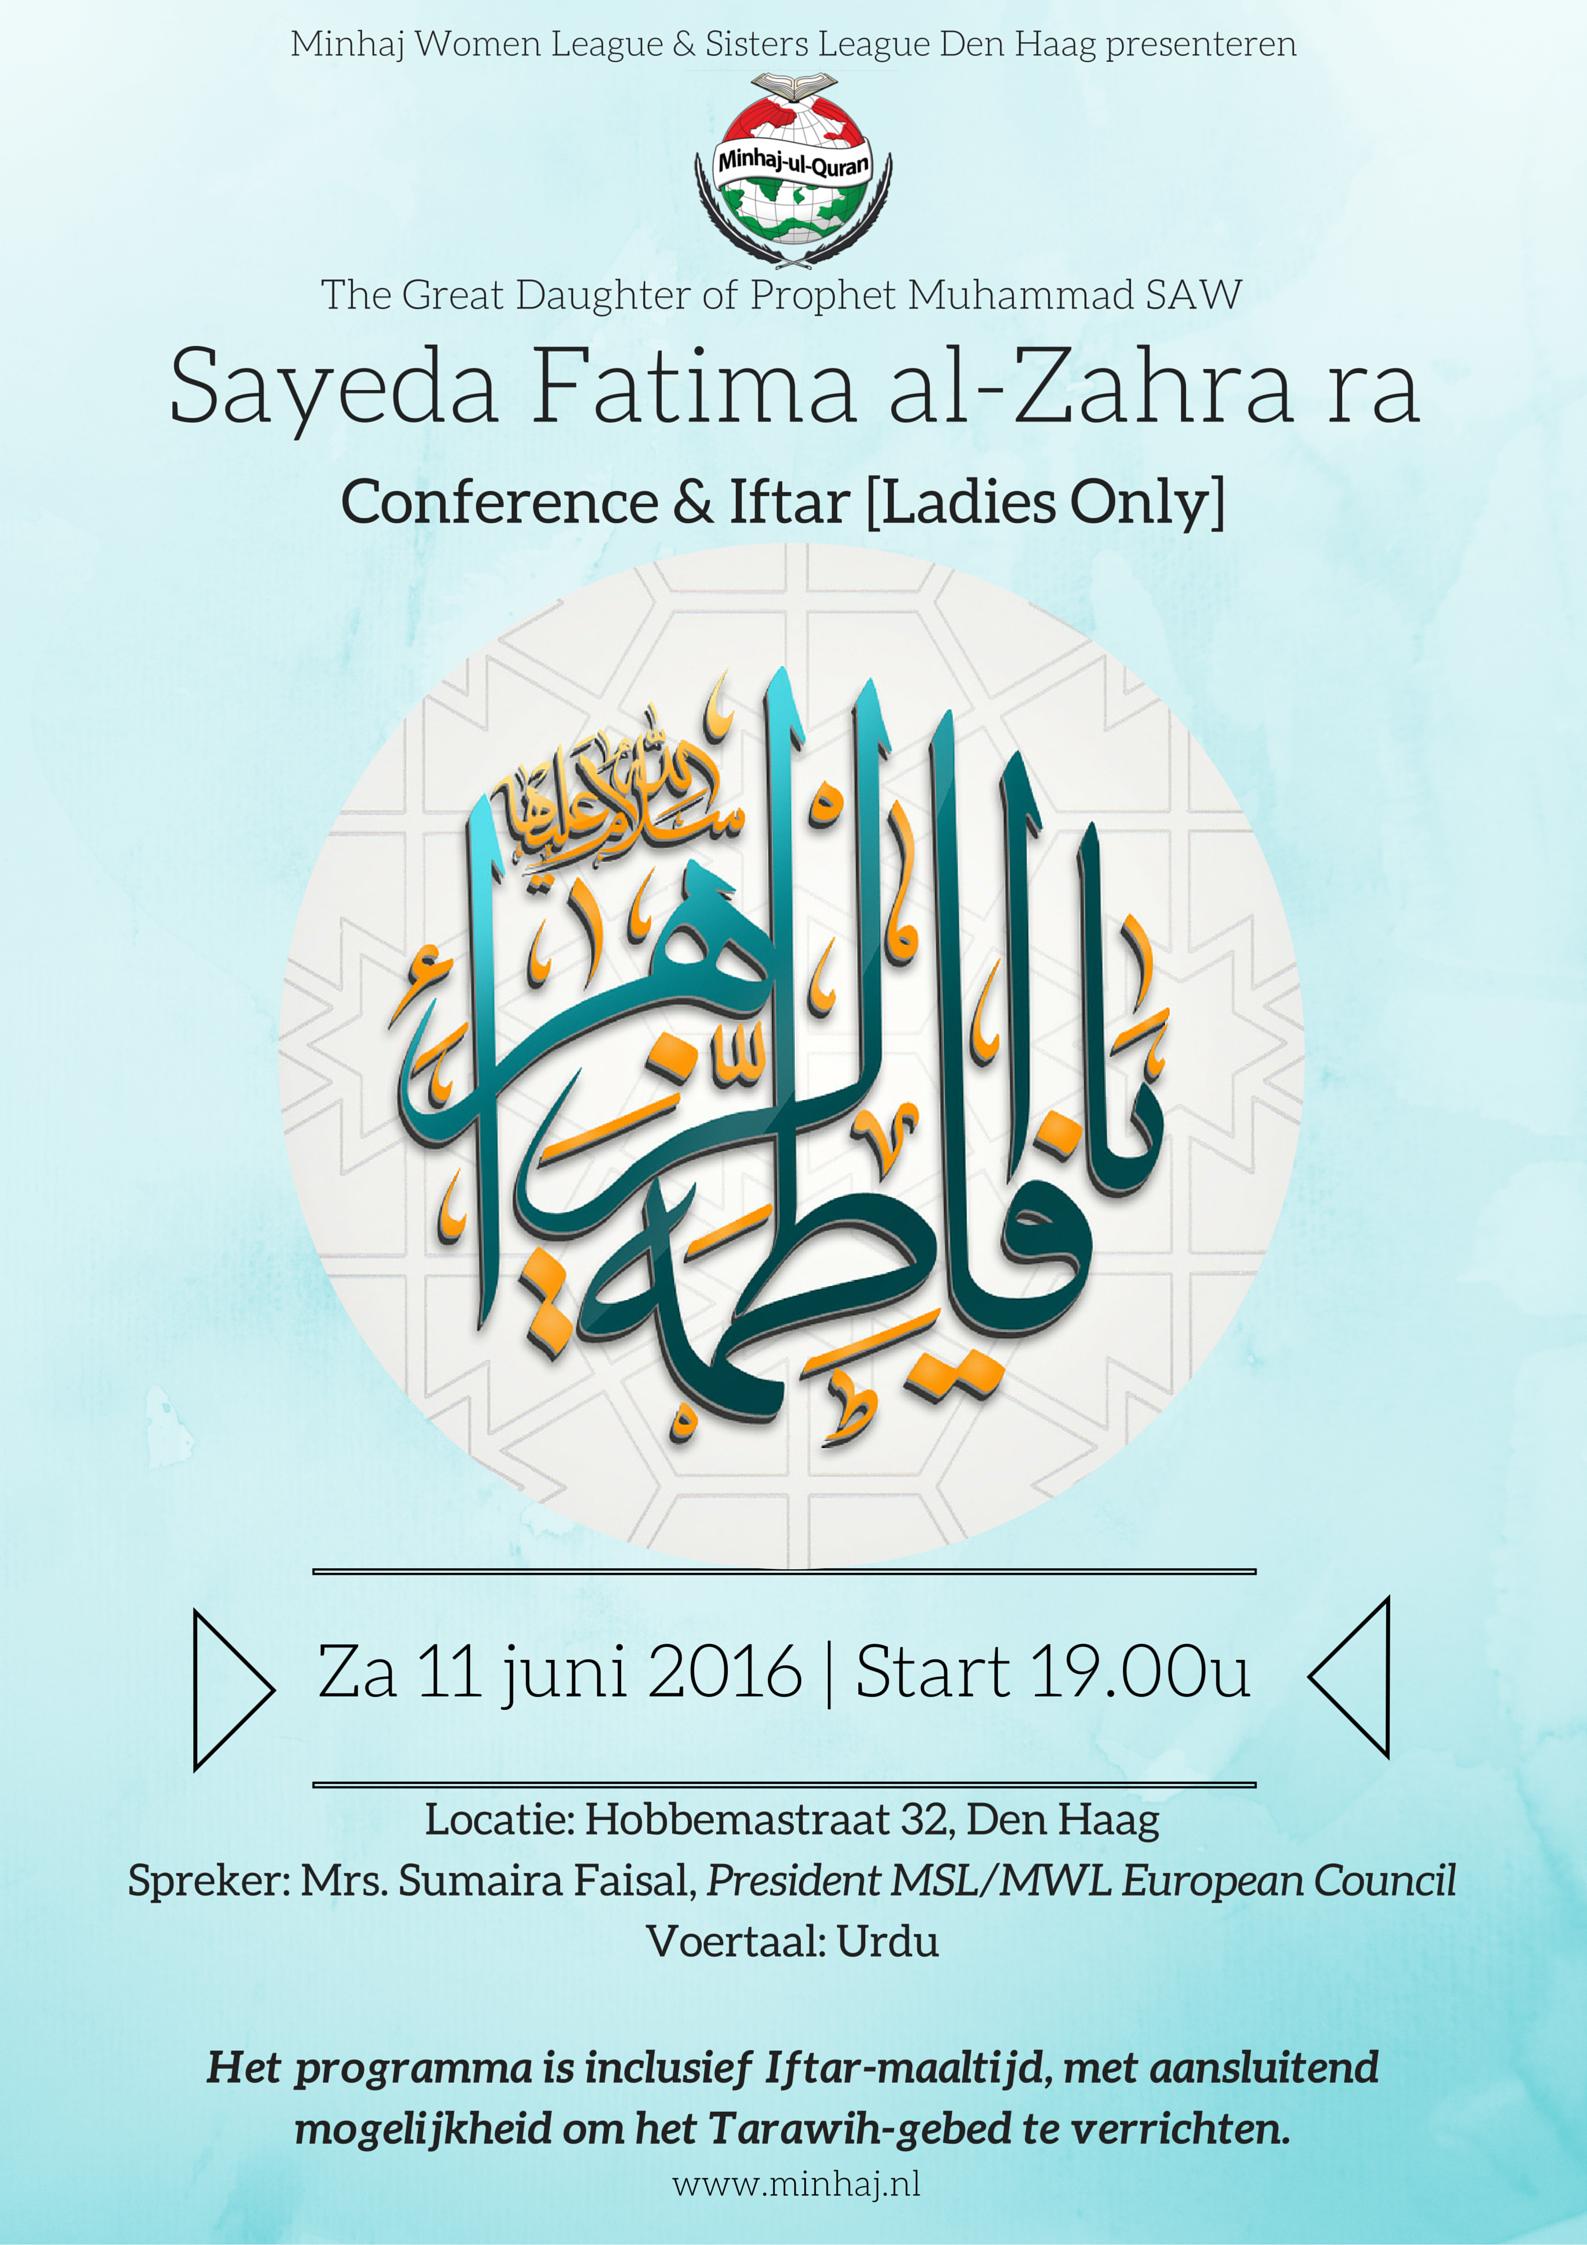 Sayeda Fatima al-Zahra Conference & Iftar | Den Haag, 11 juni